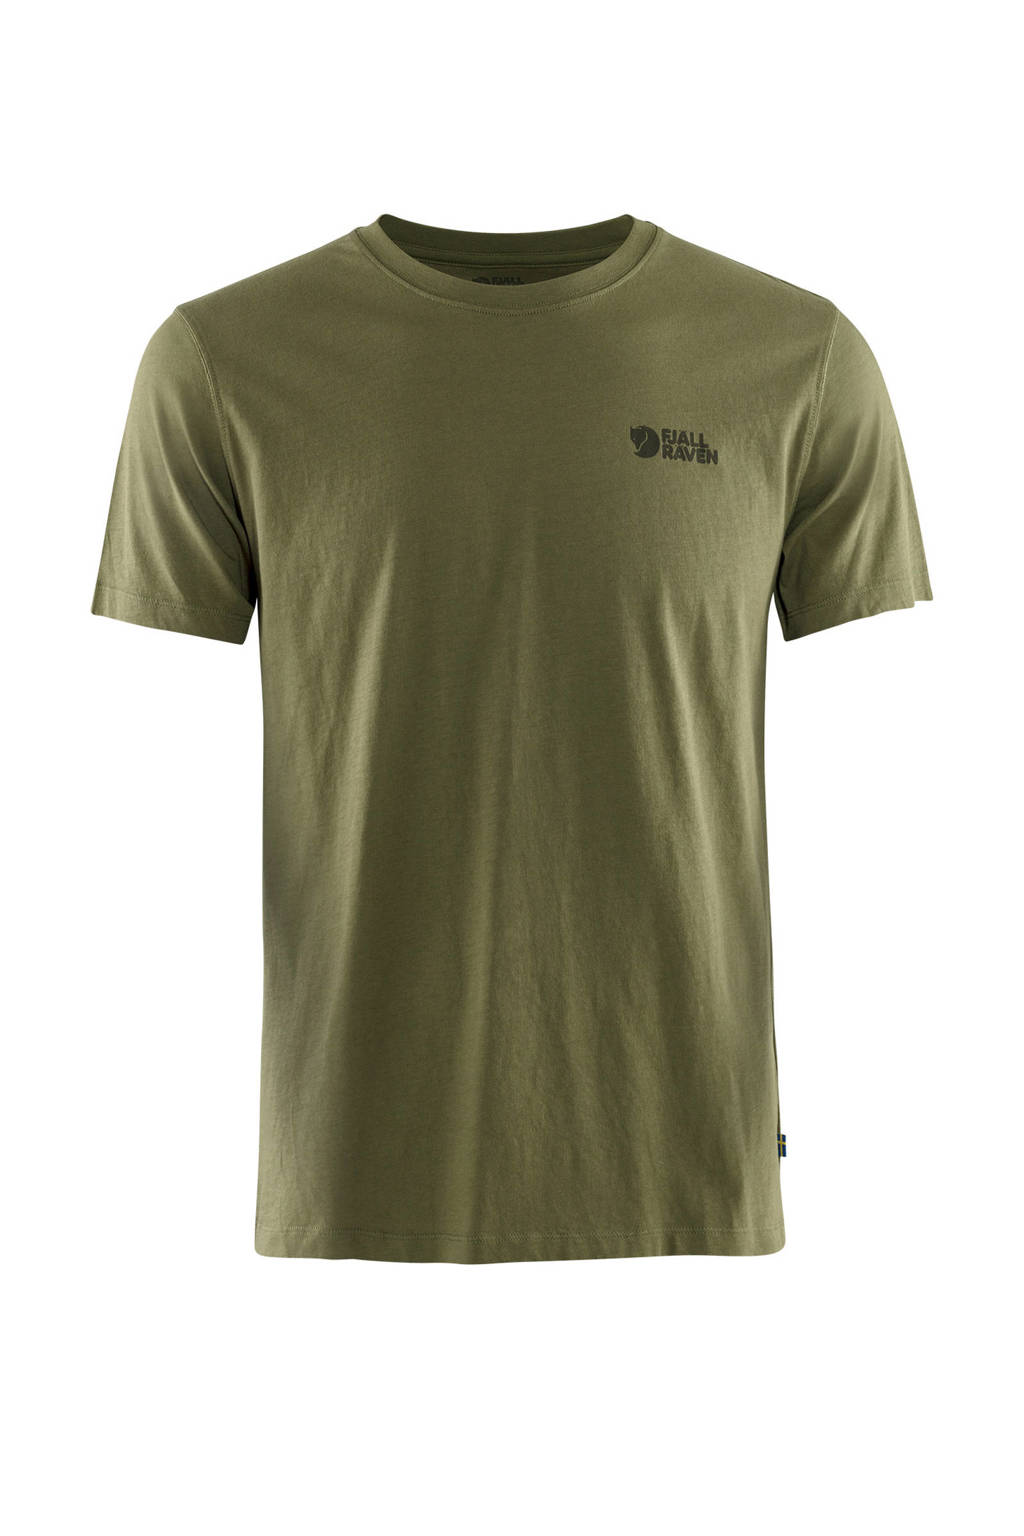 Fjällräven outdoor T-shirt olijfgroen, Olijfgroen